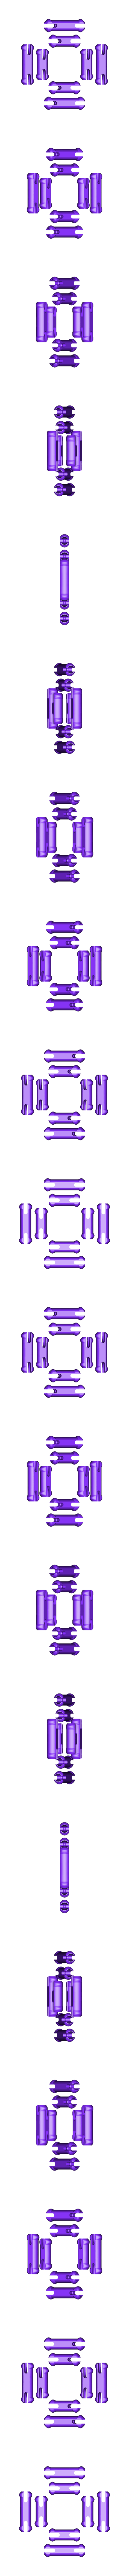 PLA-gear-heart-pins.stl Download free STL file PLA Heart Gears for Replicator 2 • 3D printer model, Gaenarra